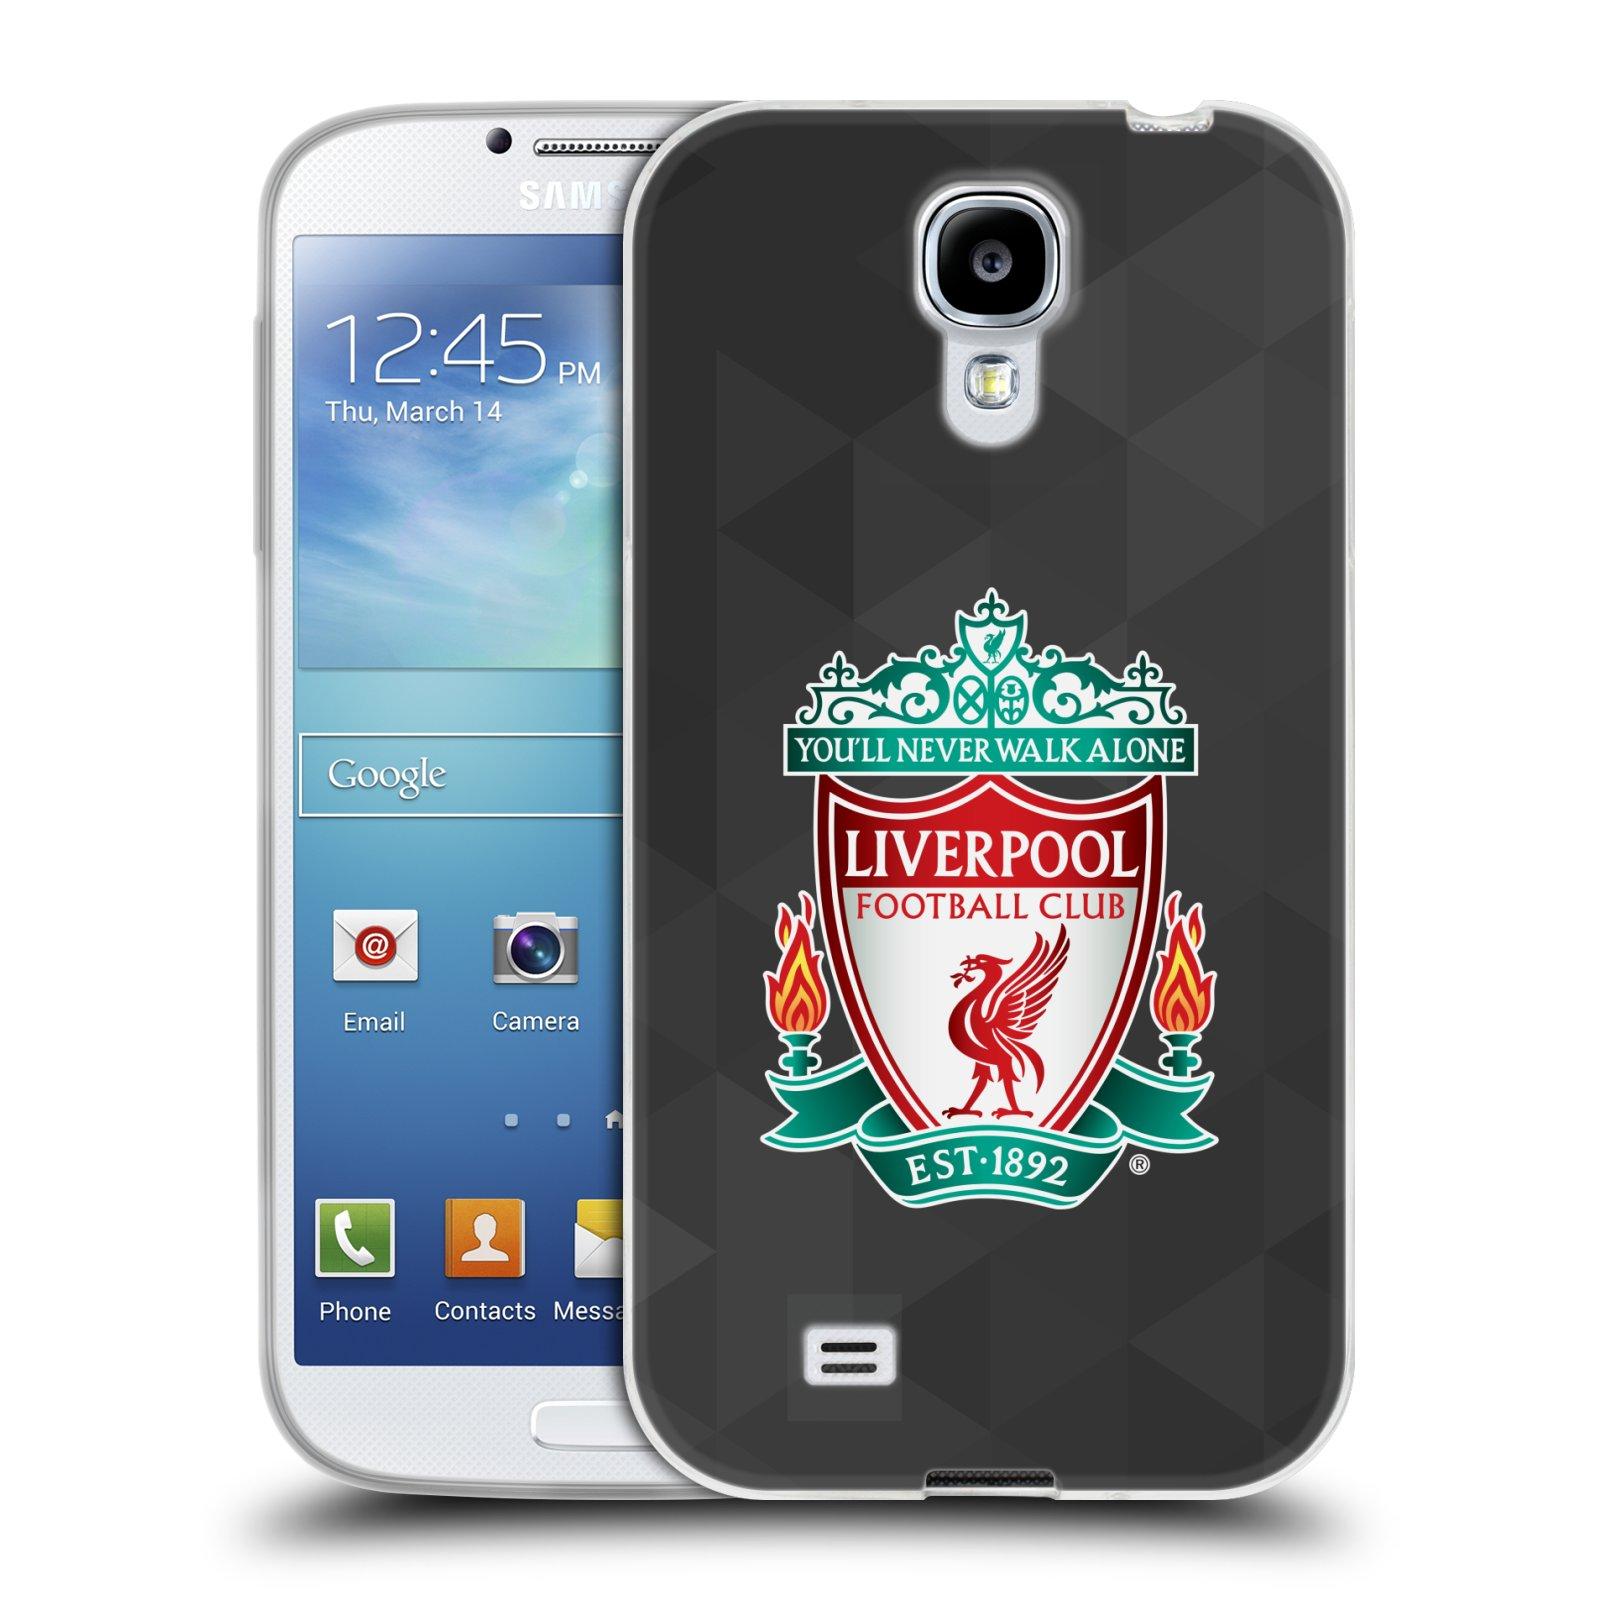 Silikonové pouzdro na mobil Samsung Galaxy S4 HEAD CASE ZNAK LIVERPOOL FC OFFICIAL GEOMETRIC BLACK (Silikonový kryt či obal na mobilní telefon Liverpool FC Official pro Samsung Galaxy S4 GT-i9505 / i9500)